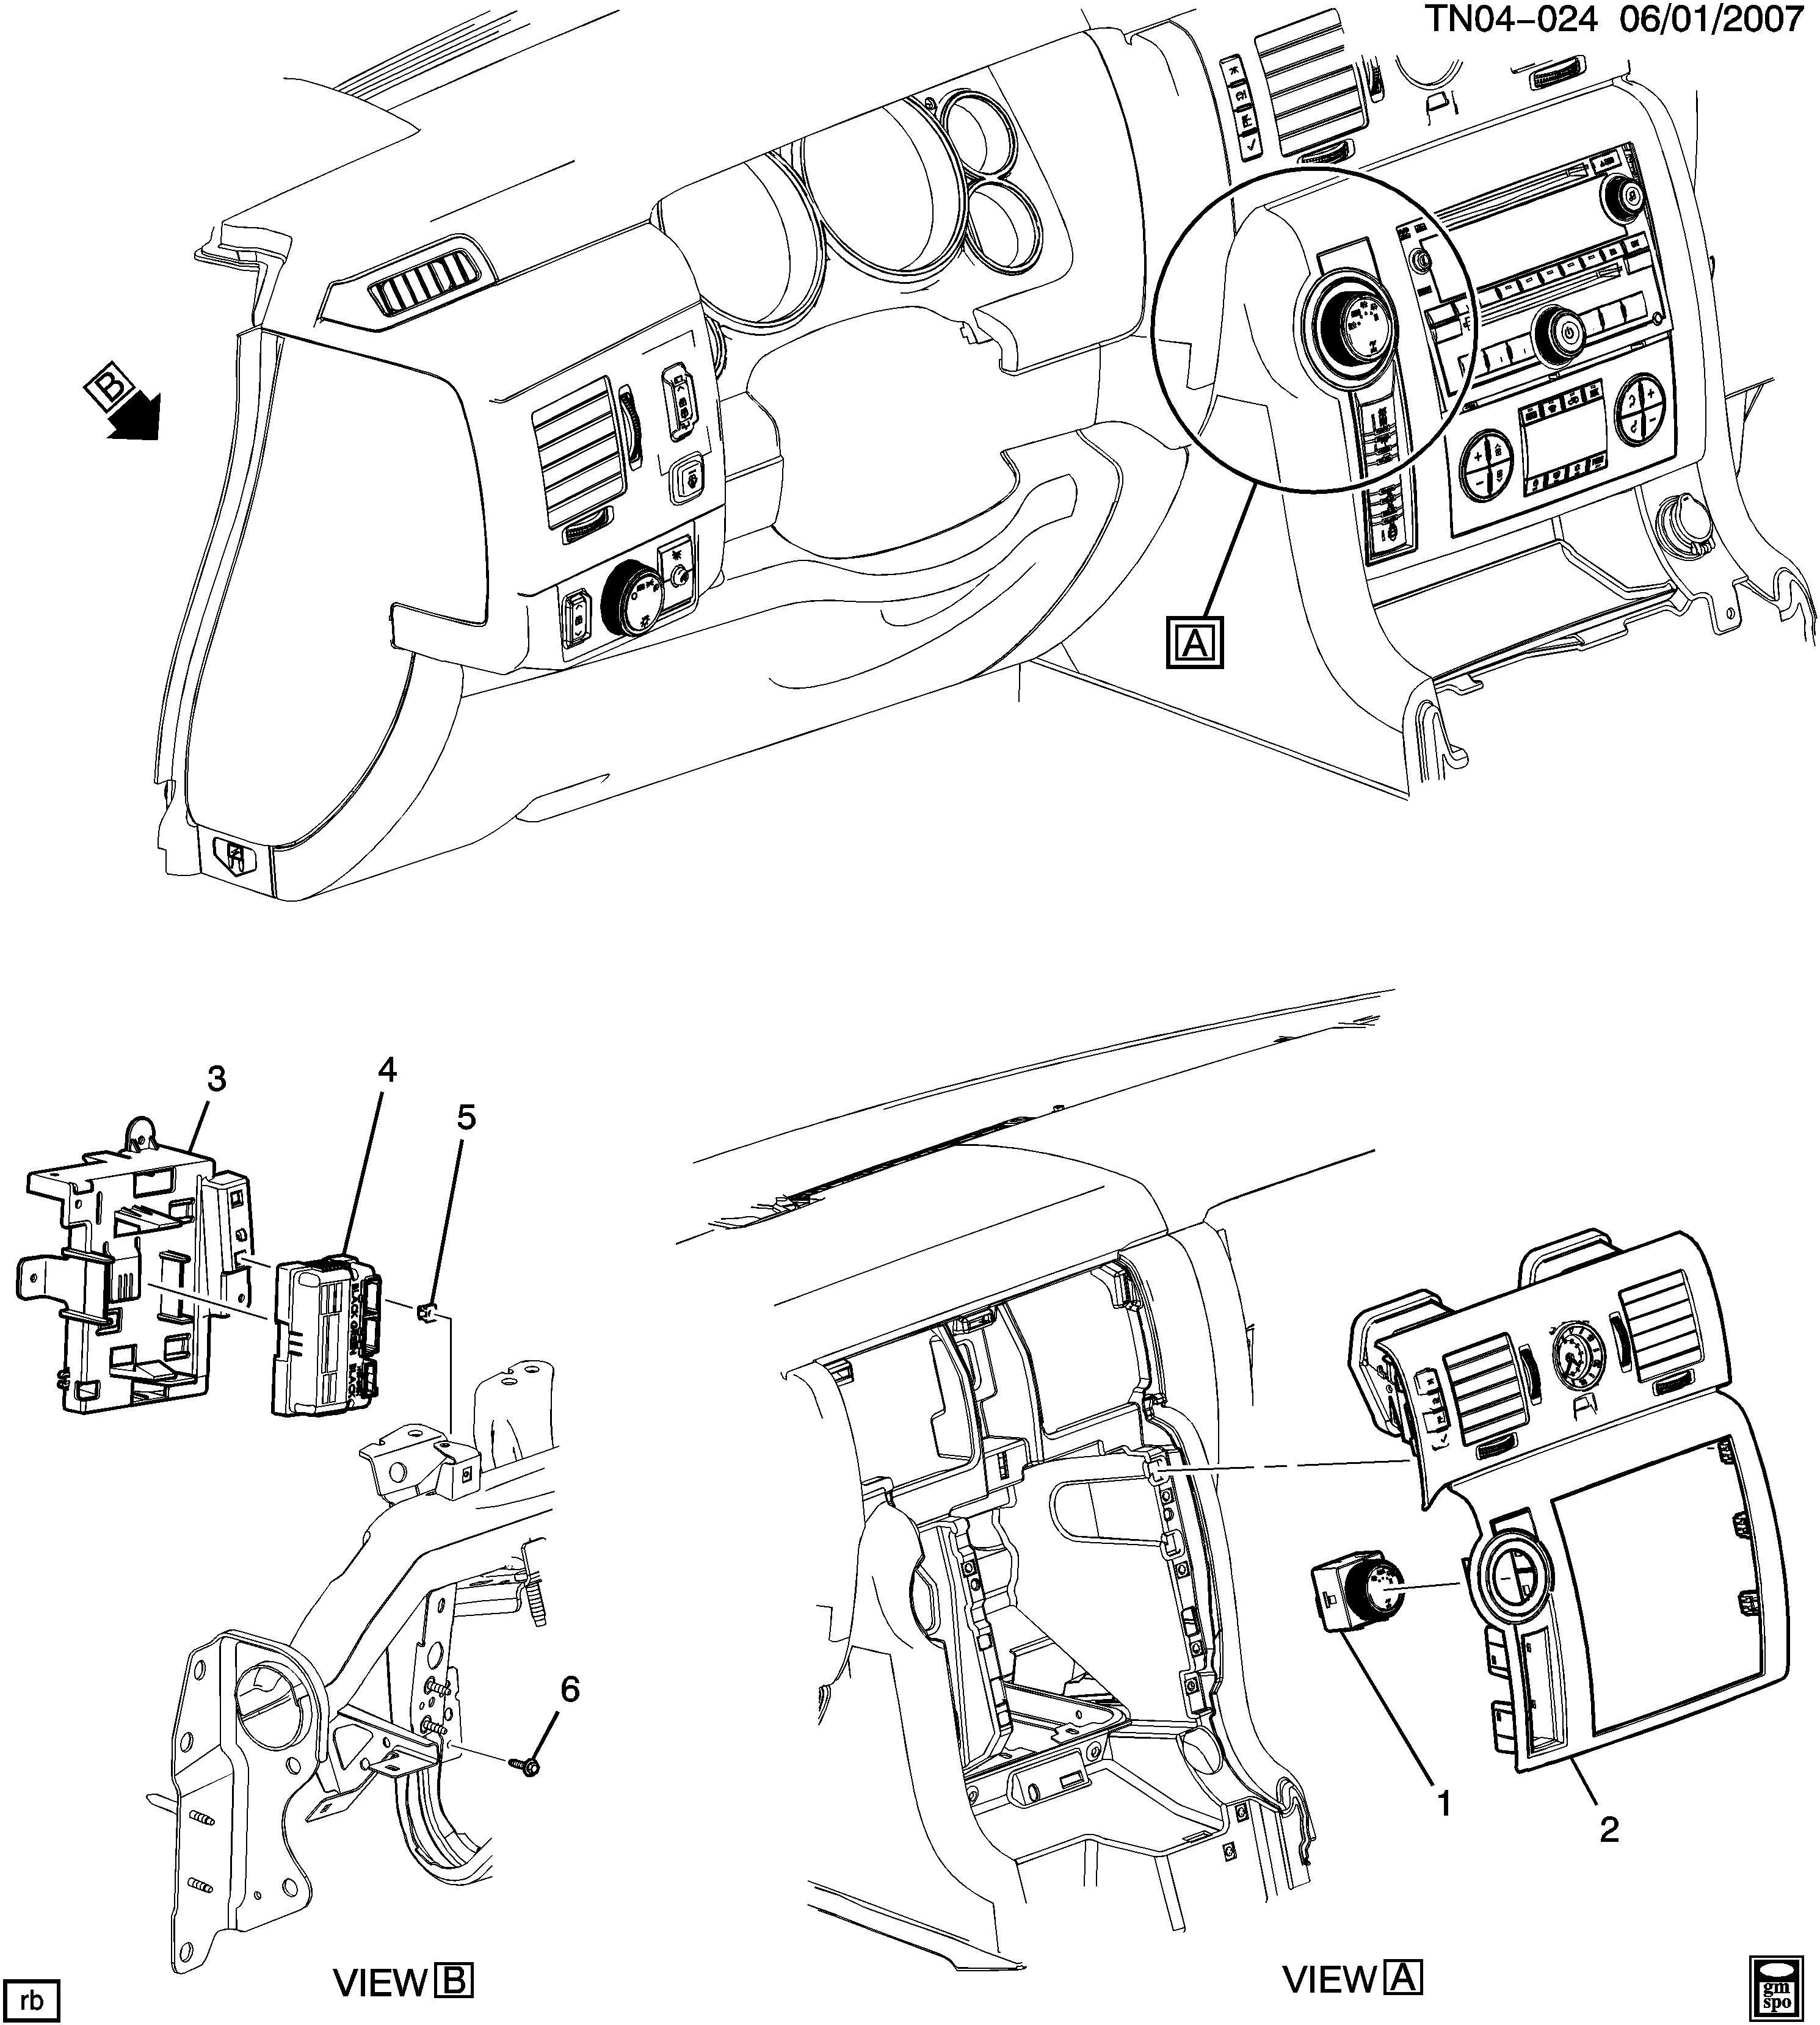 hummer h2 transfer case control module